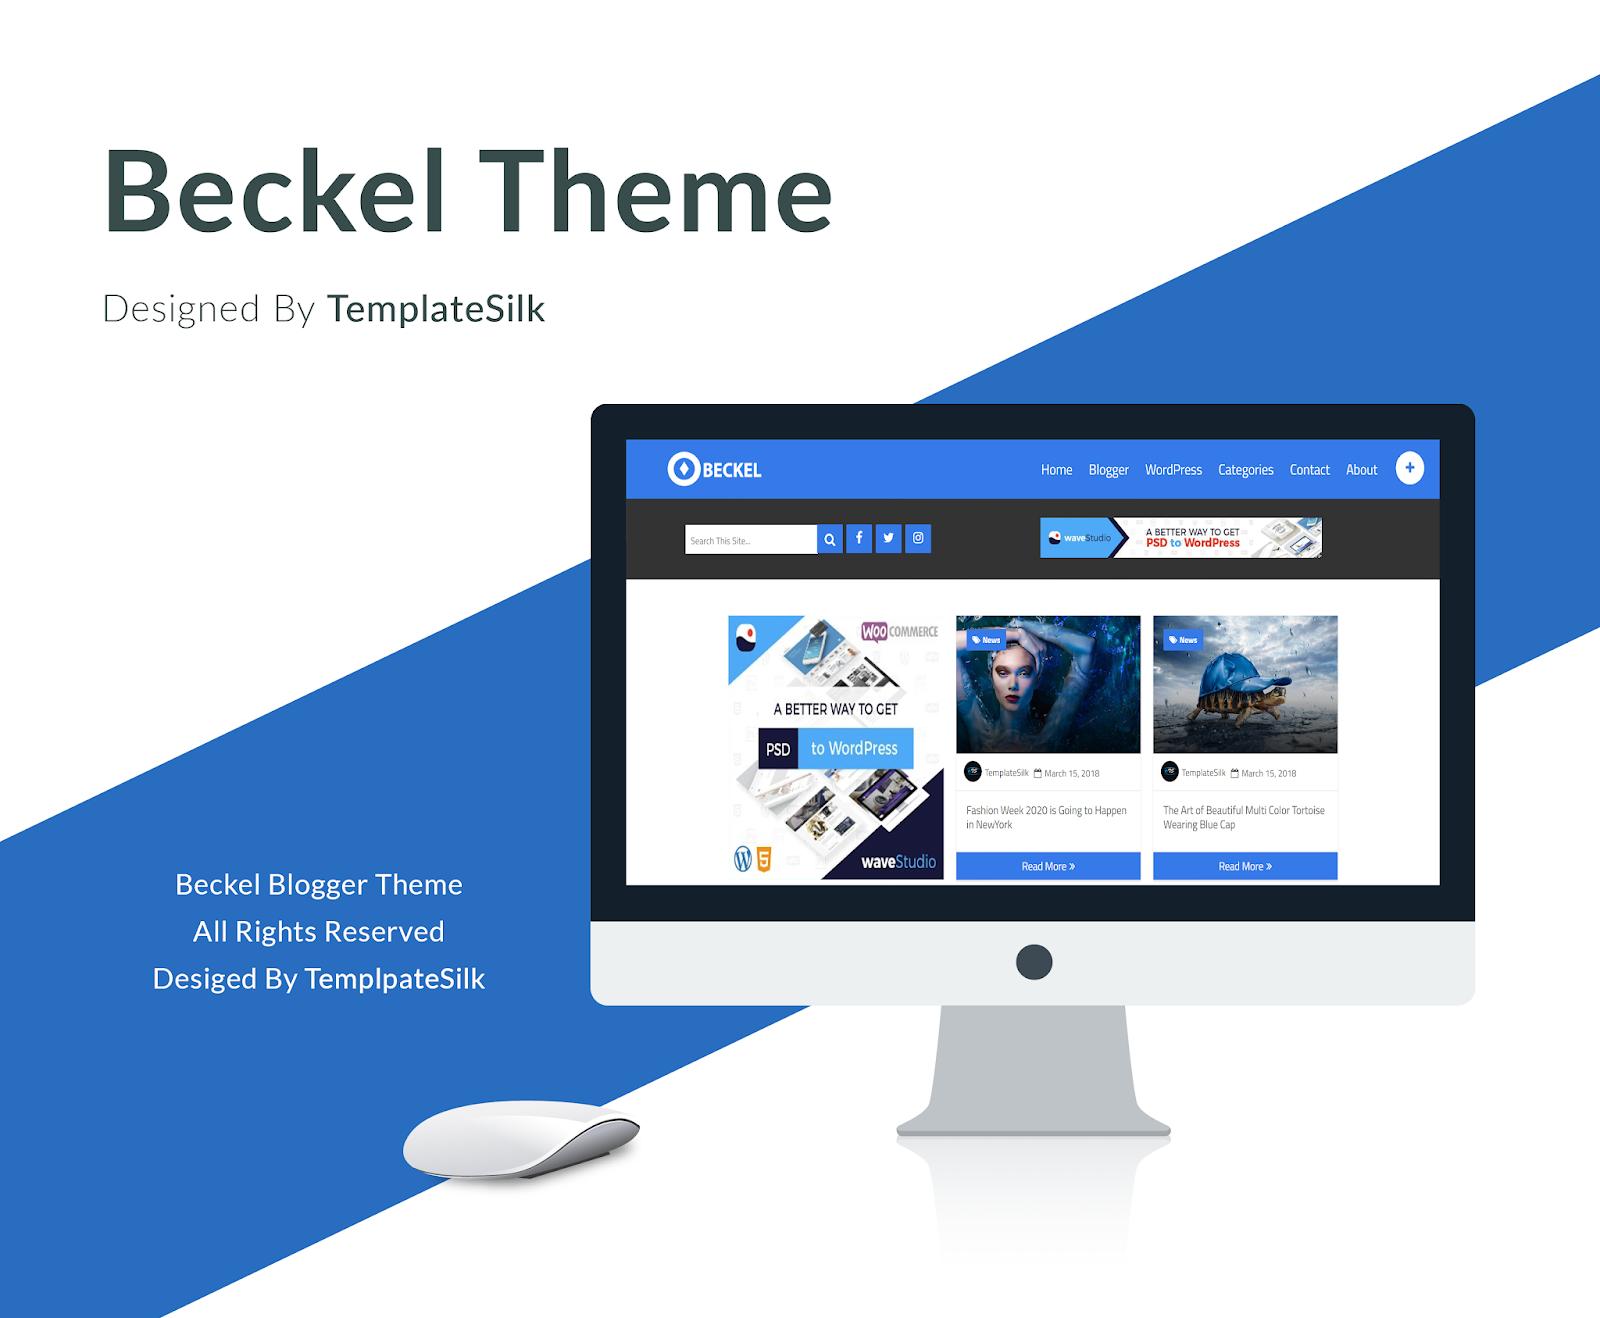 Beckel Blogger Theme